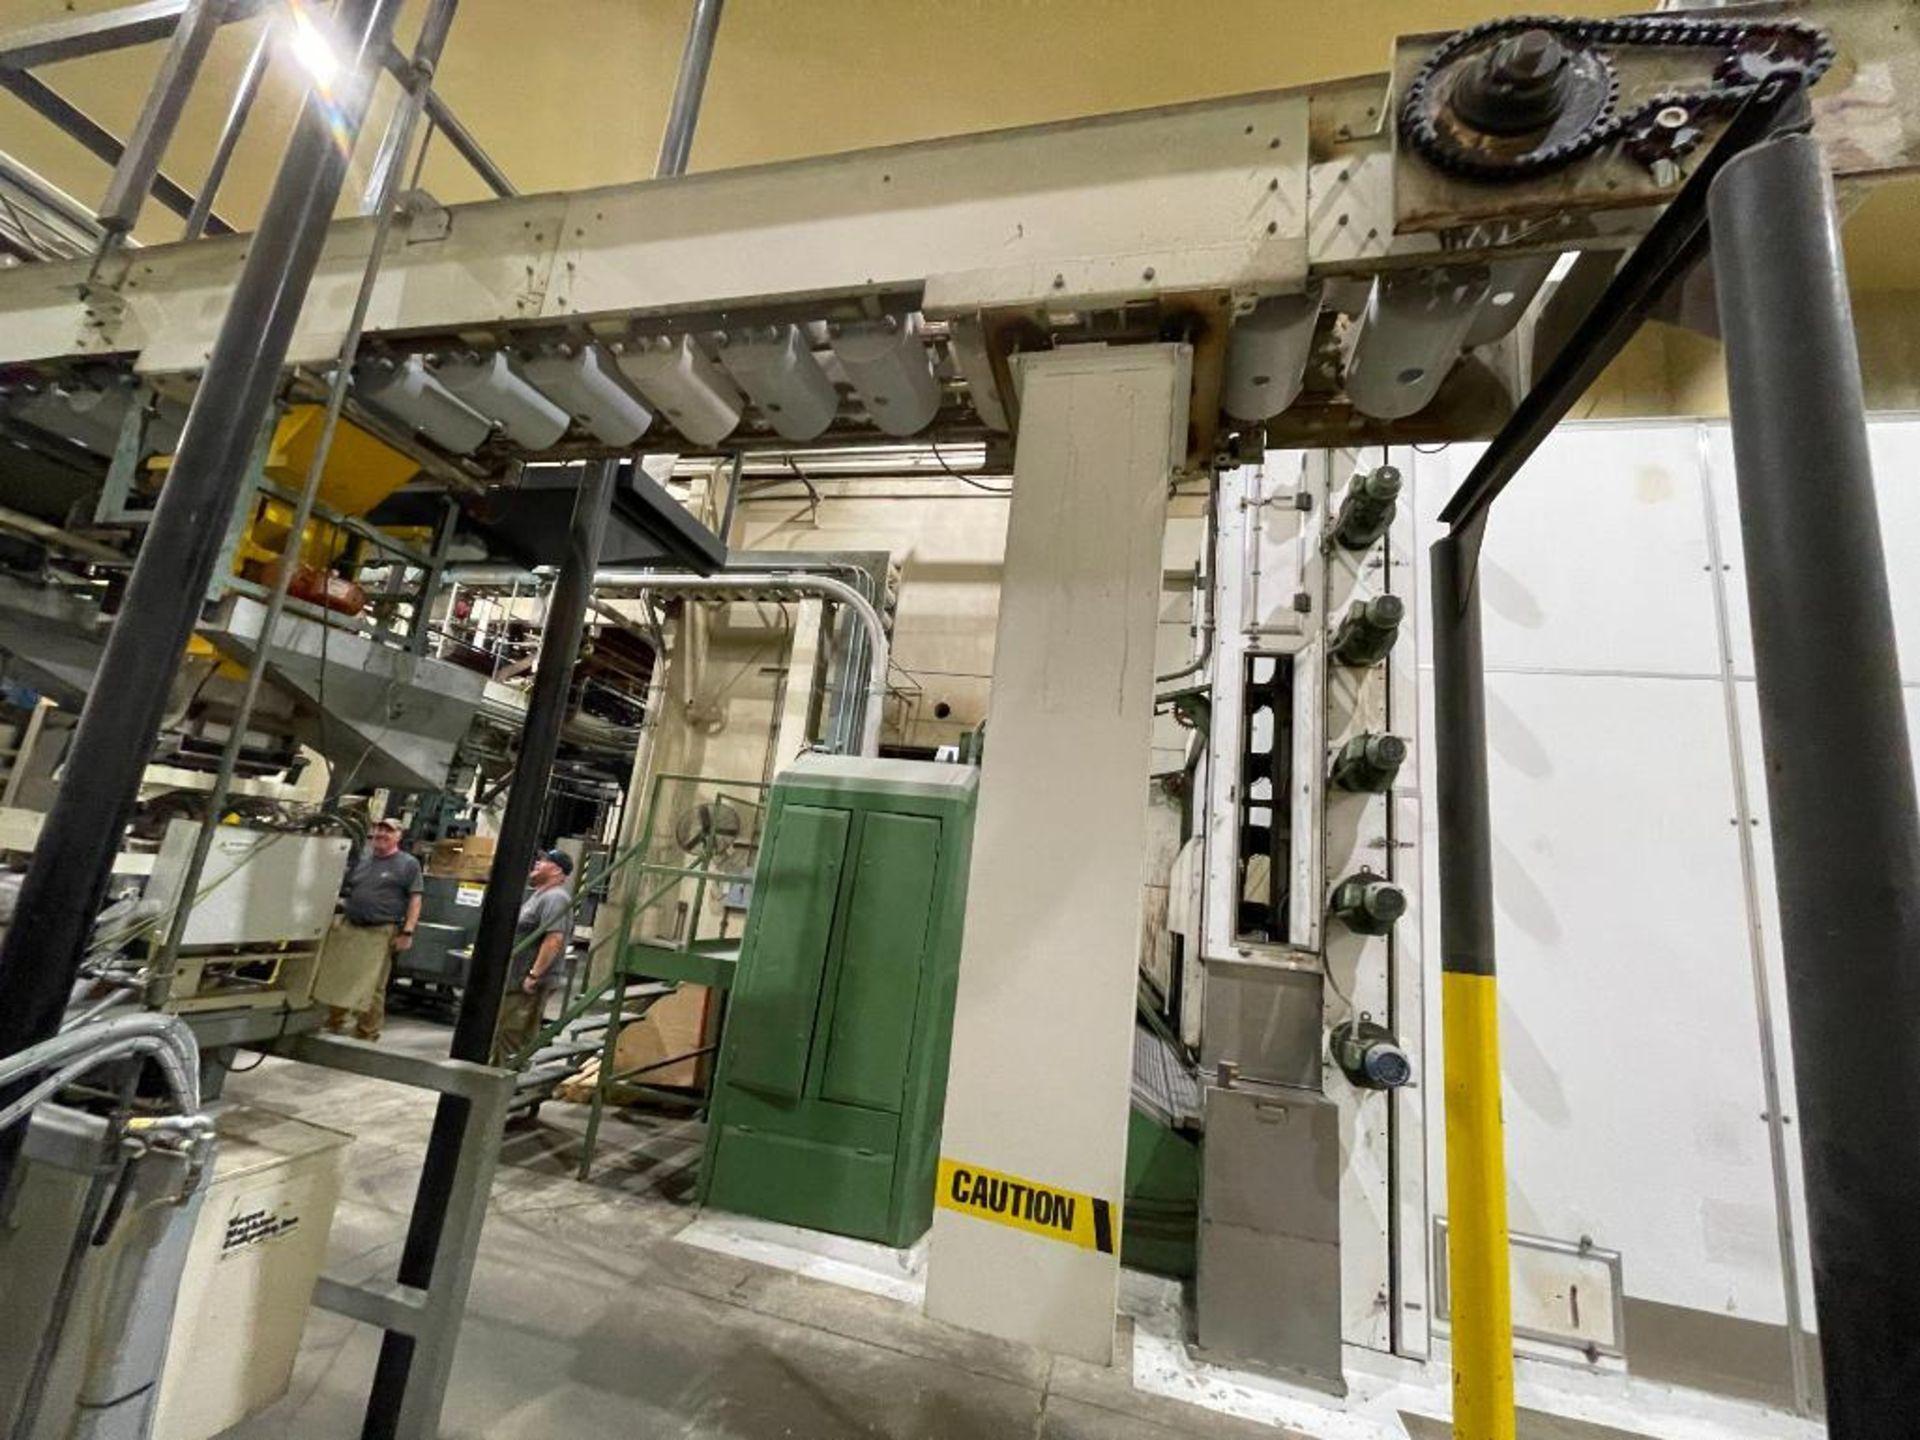 Meyer horizontal bucket elevator, model PQ-172-12-BCS - Image 2 of 19